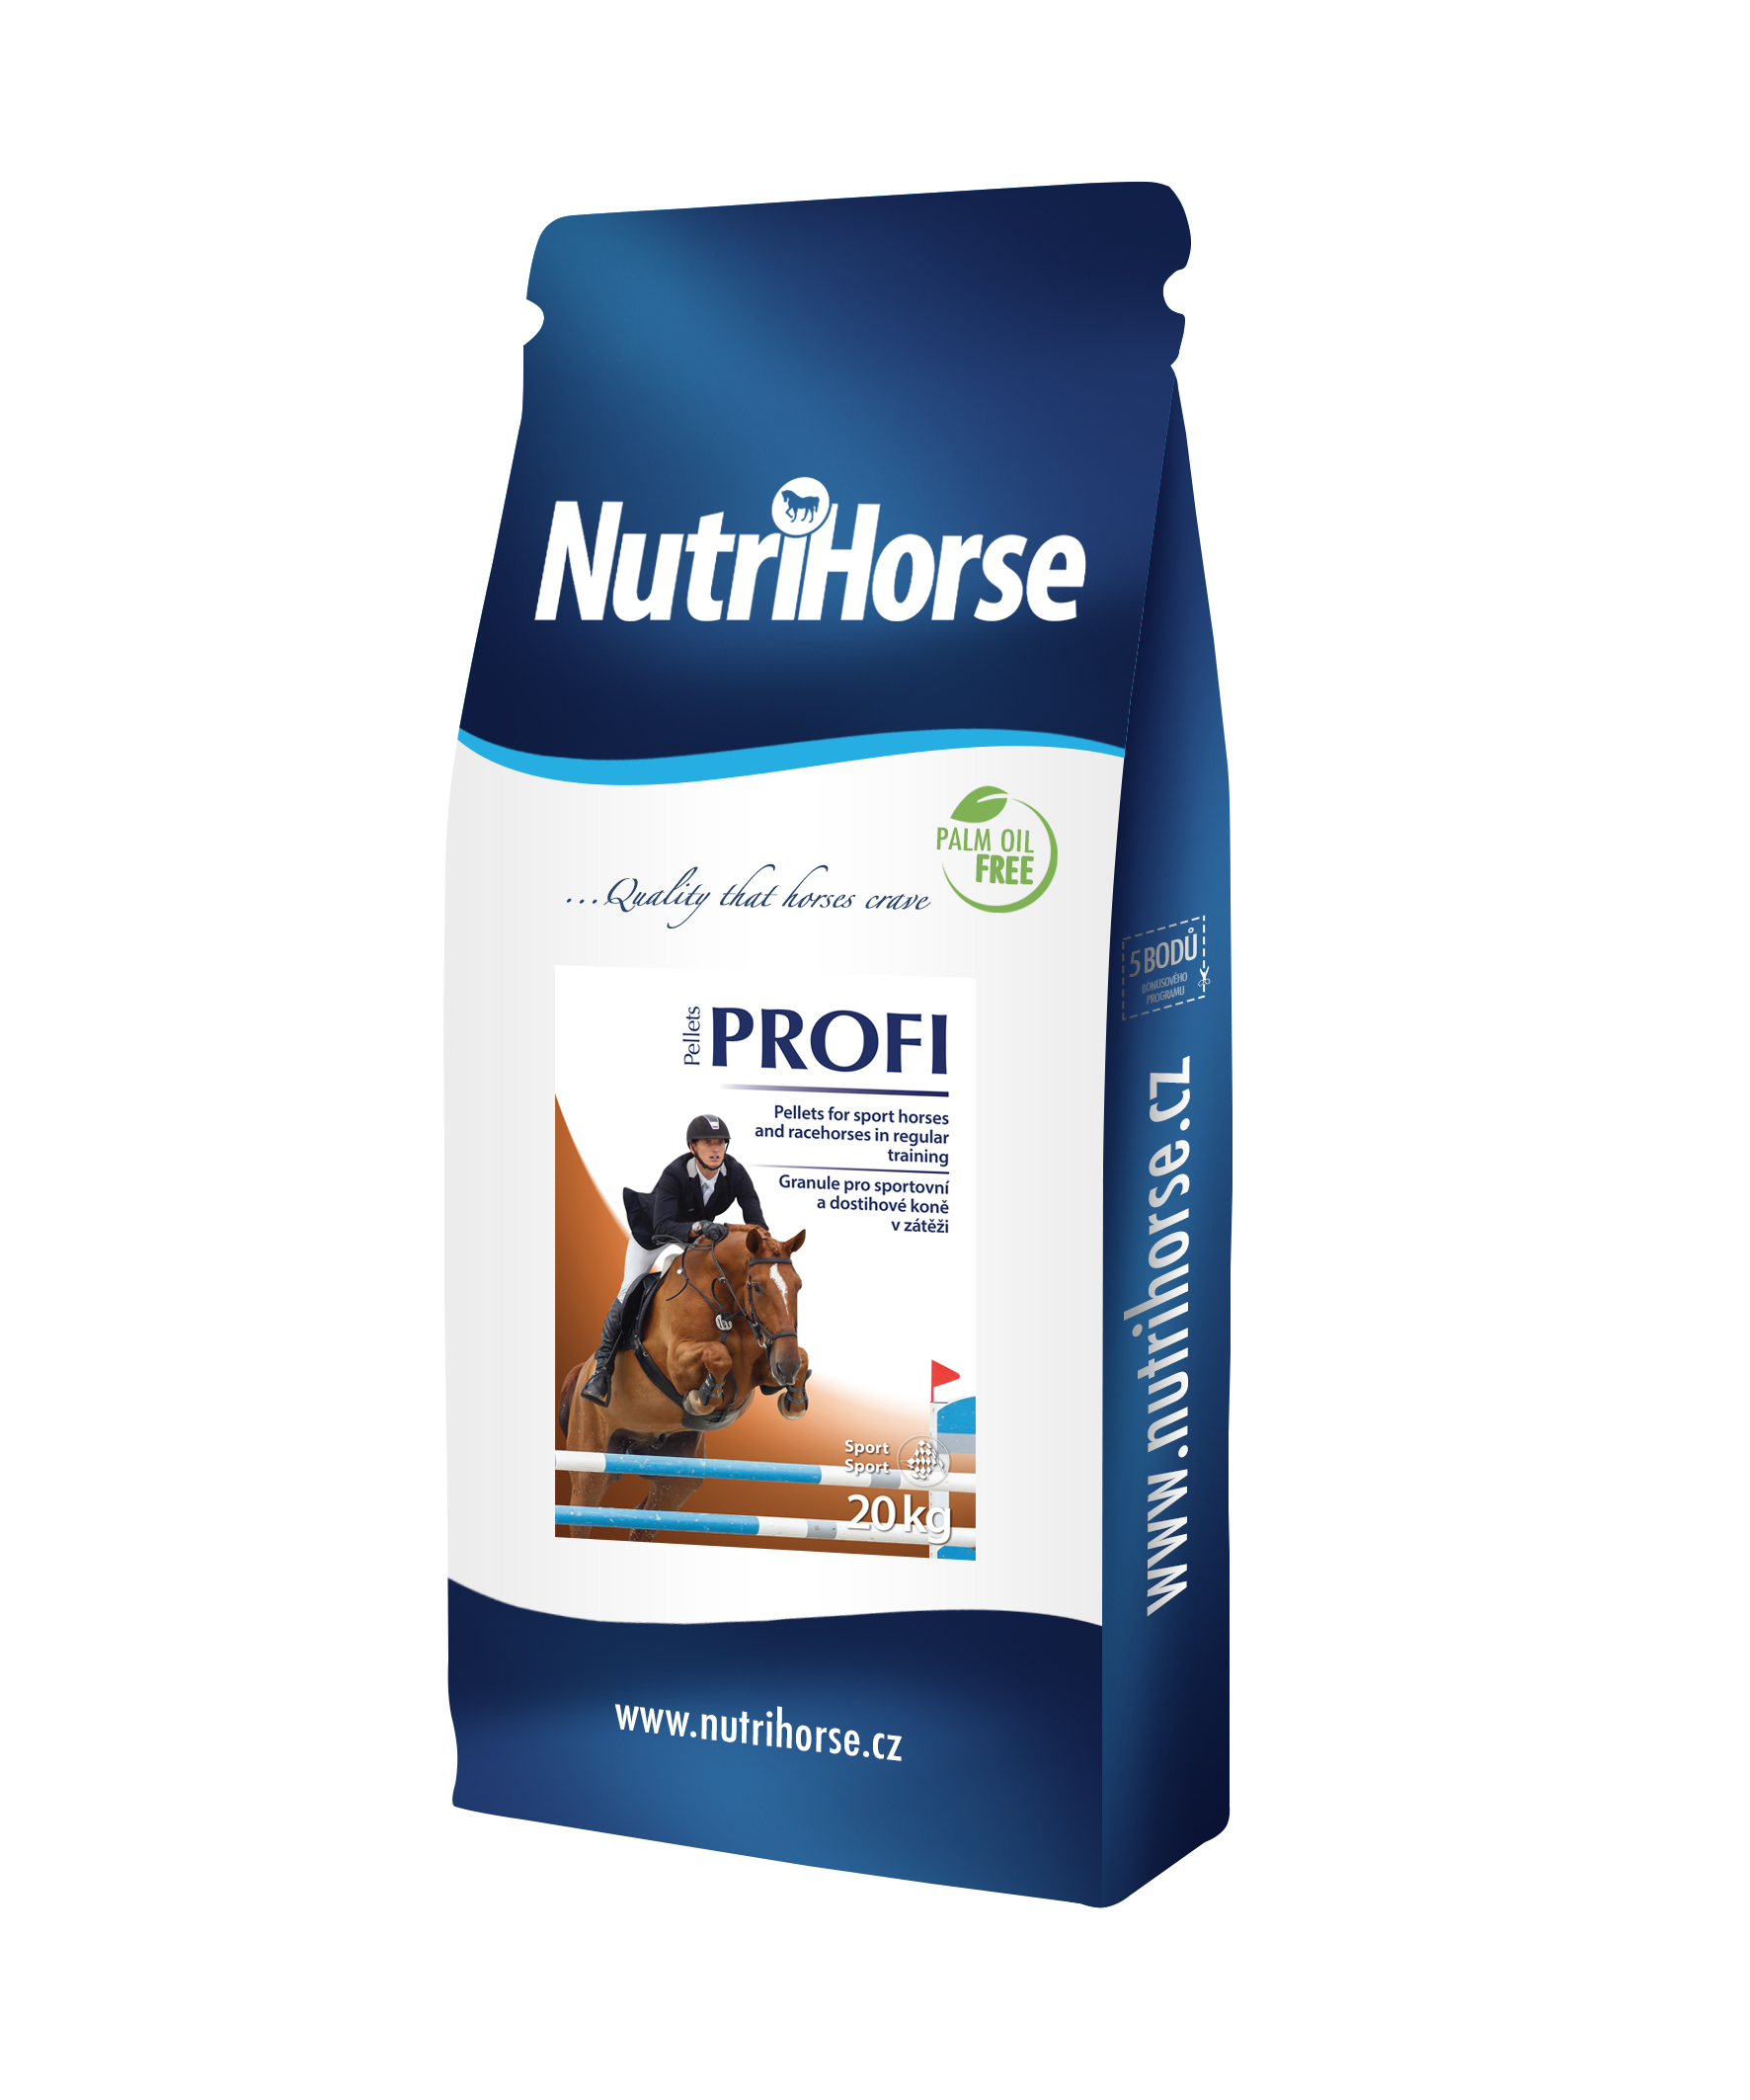 NutriHorse Profi 20 Kg pellets NEW